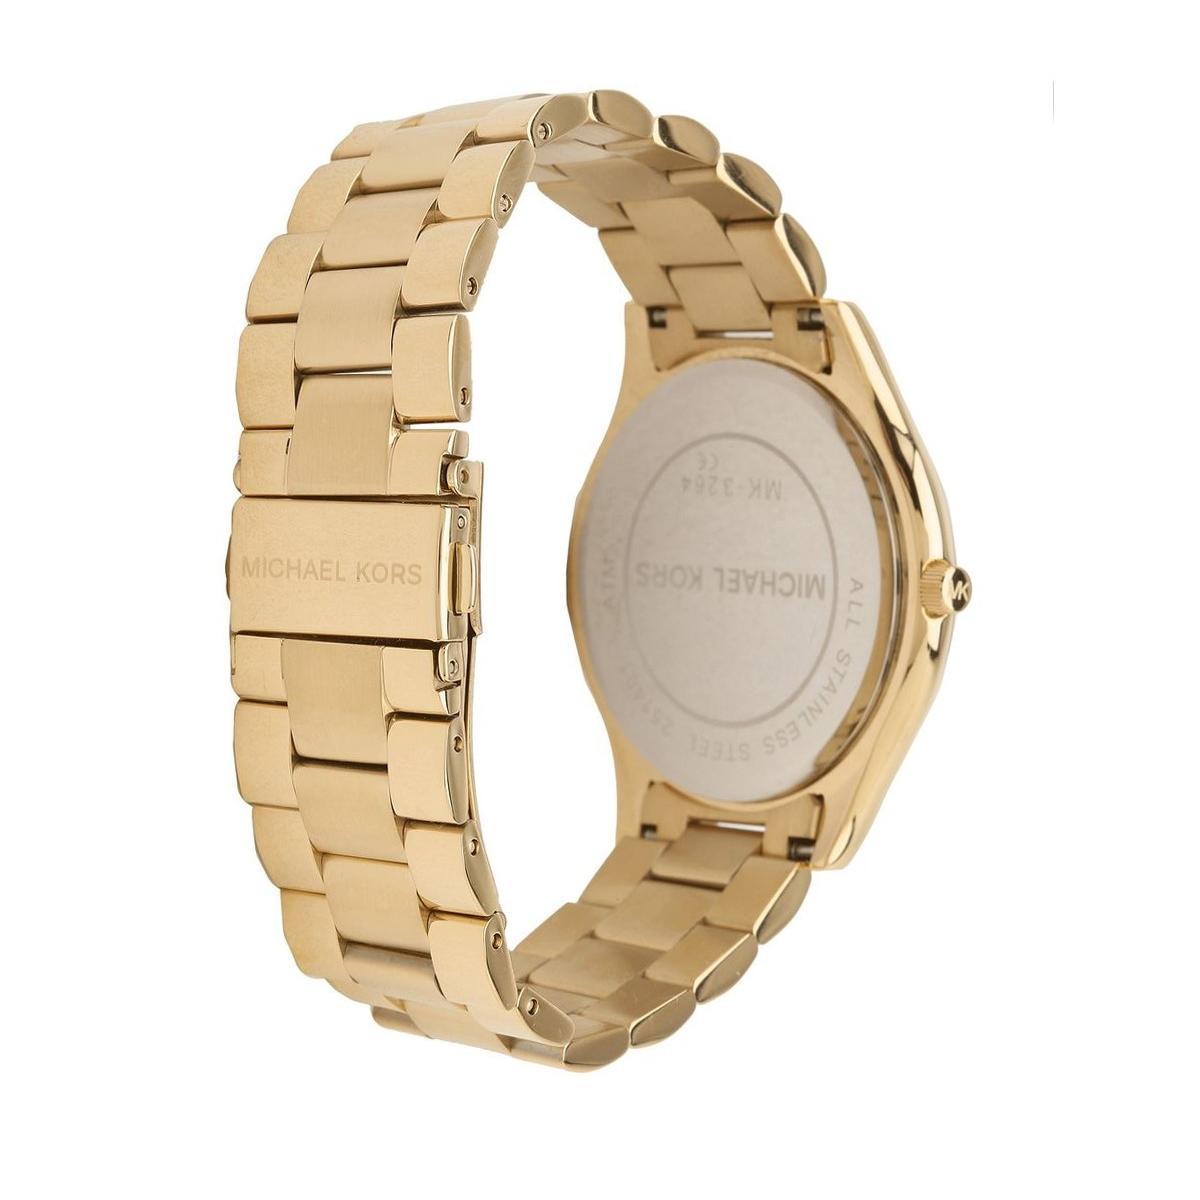 63c7789a8f61e Relógio michael kors feminino mk3264 - Relógio Feminino - Magazine Luiza